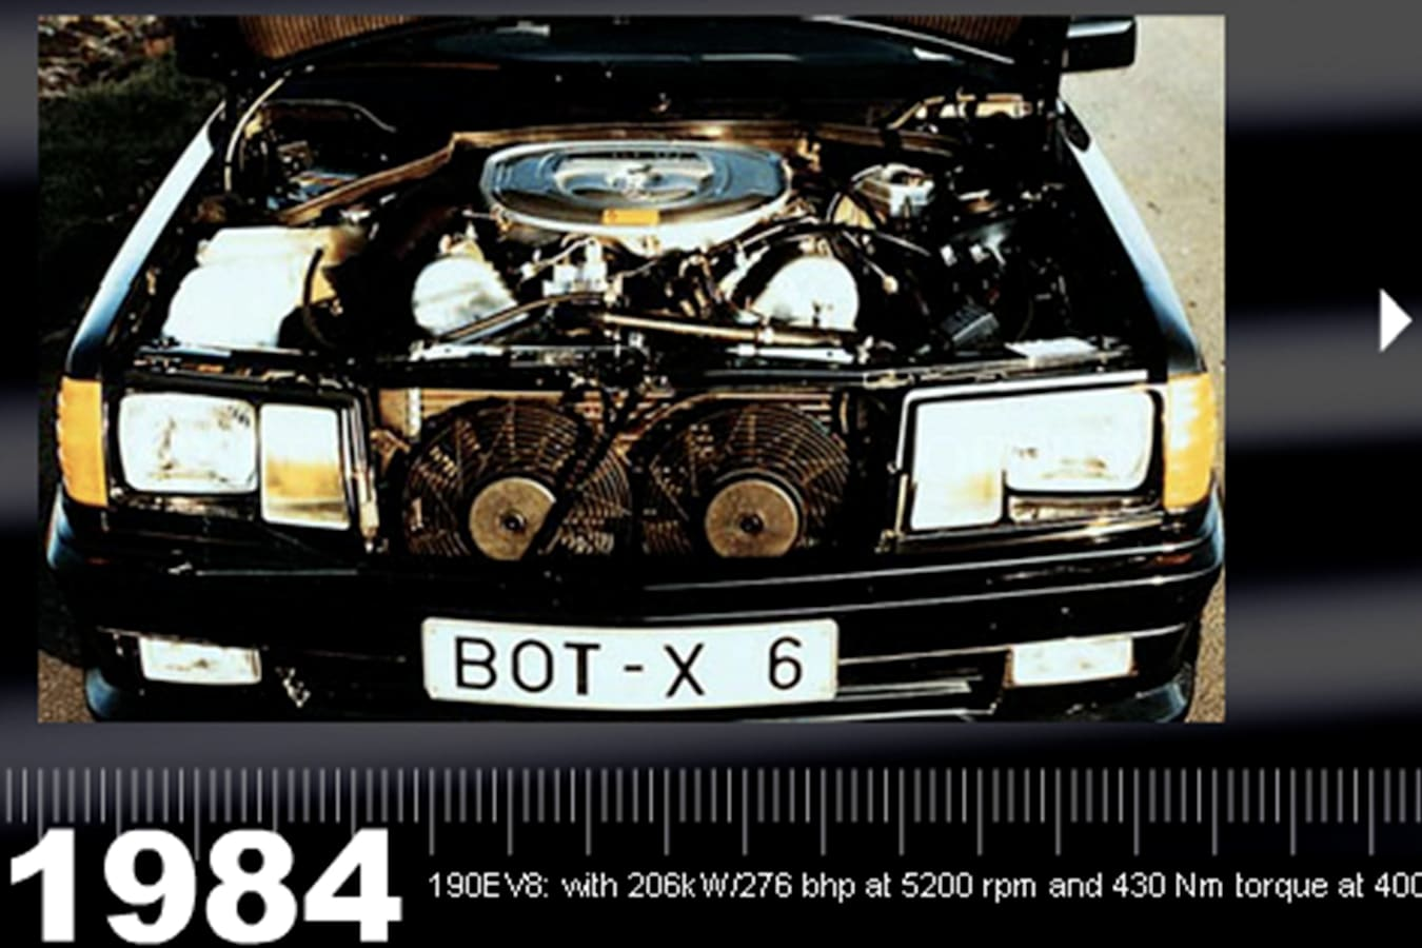 Brabus 190 Ev 8 Engine Jpg